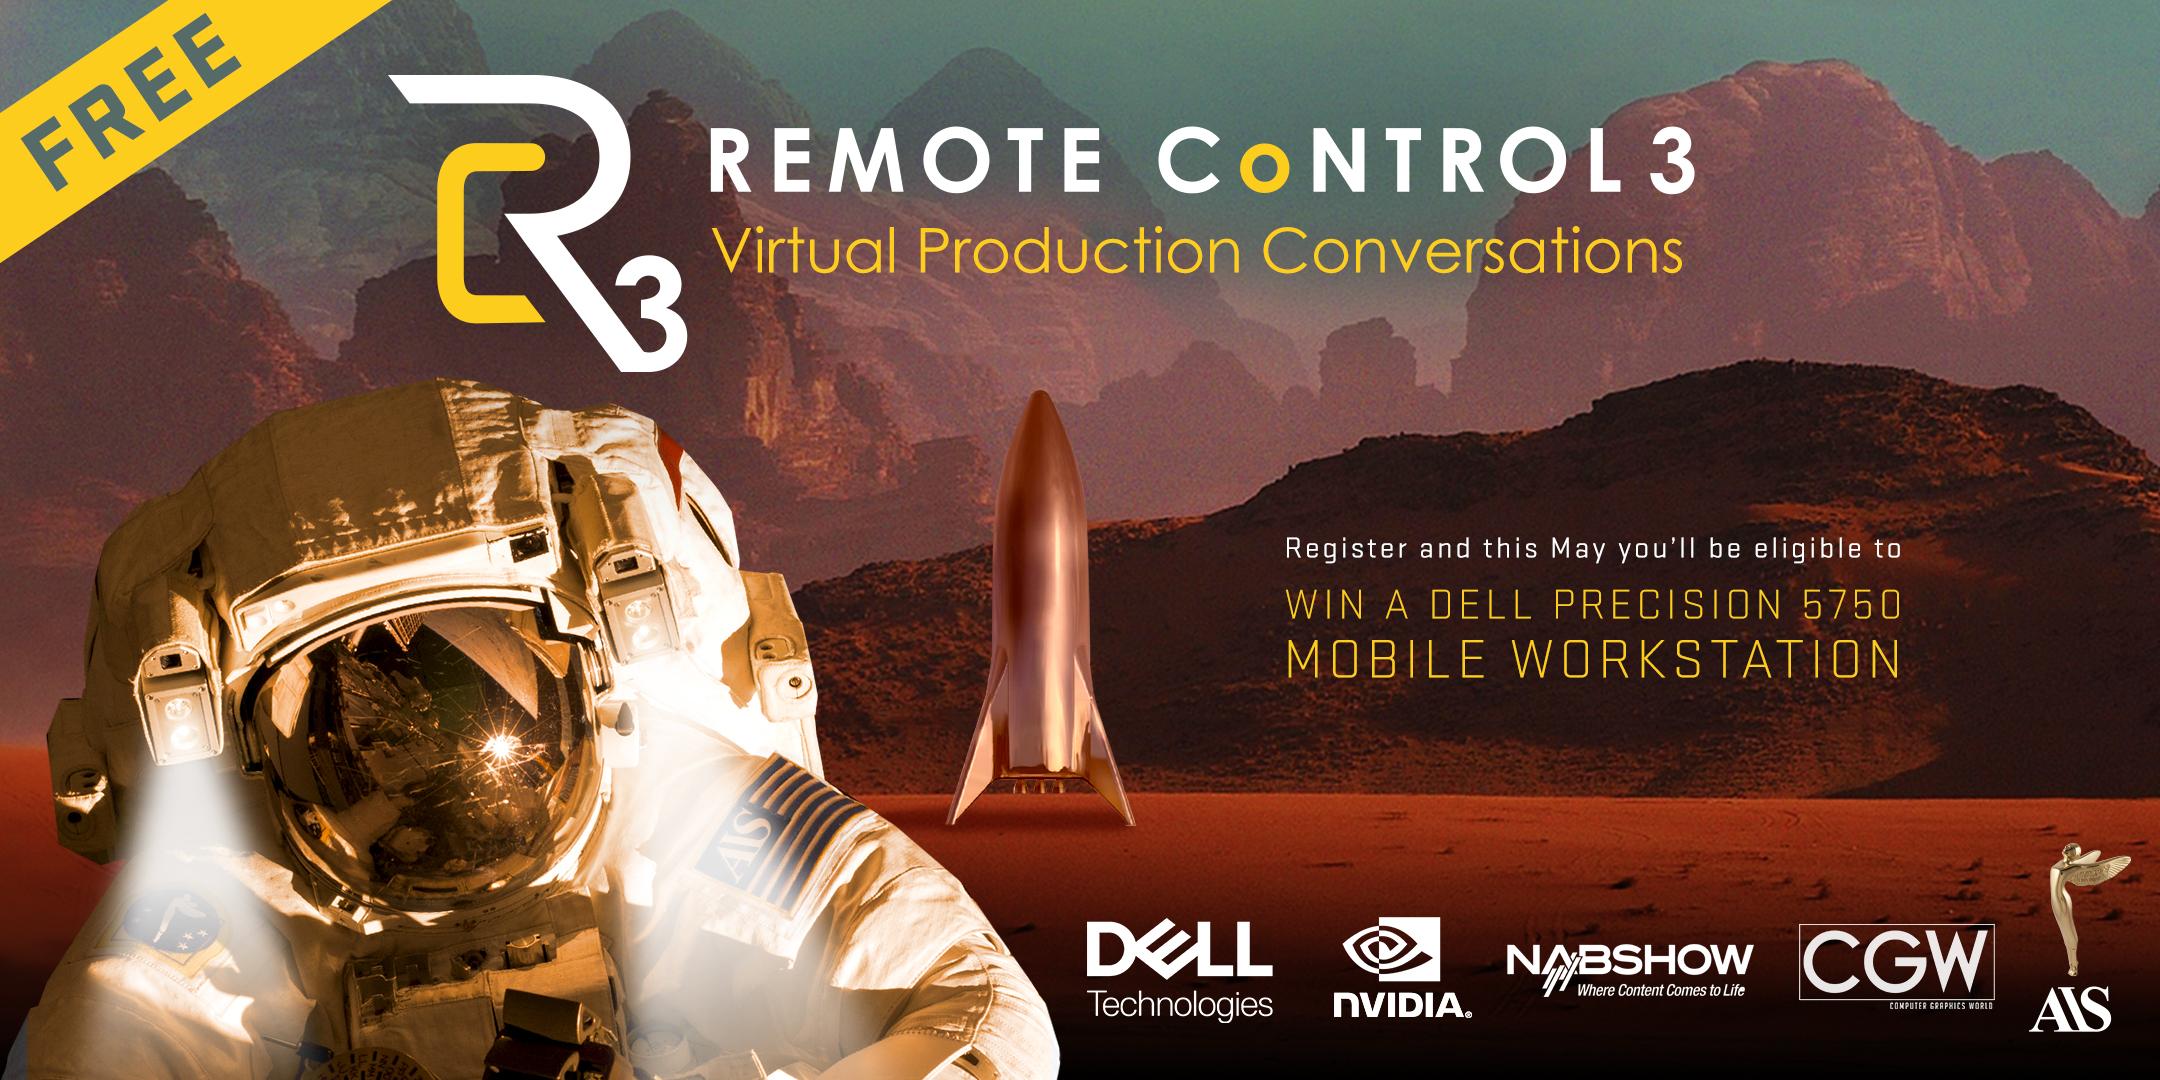 Remote Control 3 Virtual Production Conference